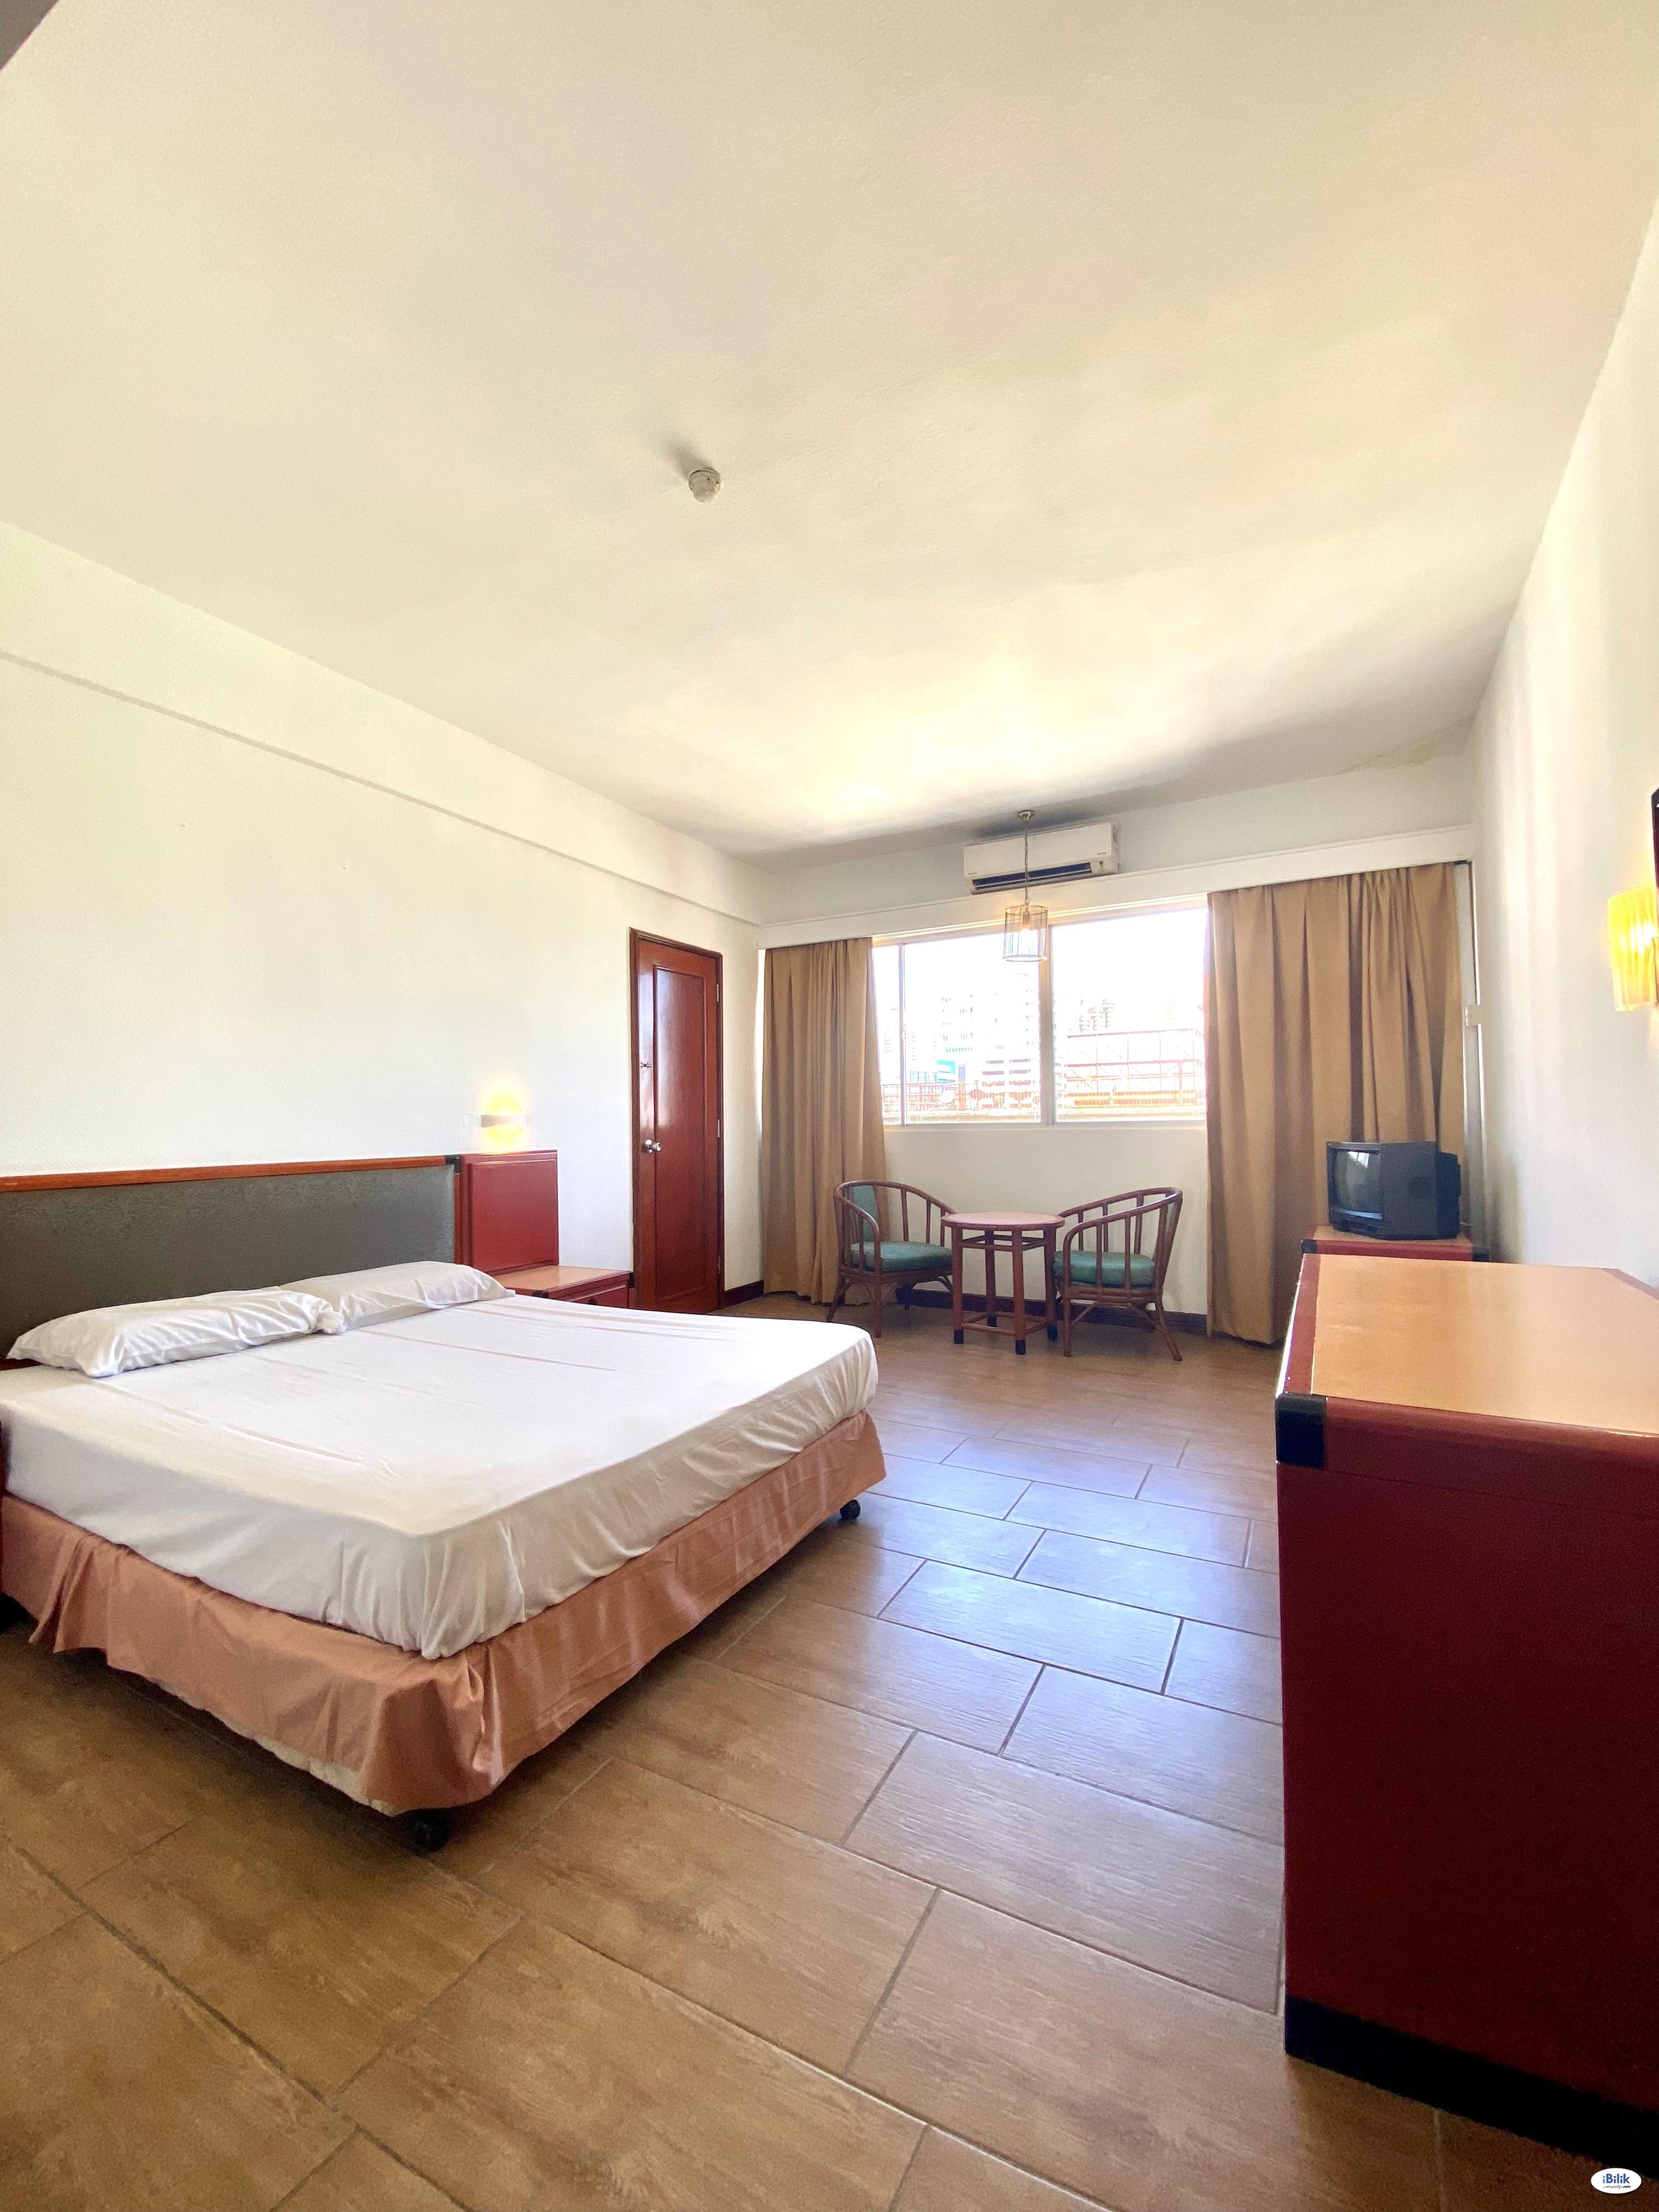 Room - Resort Hotel at Chow Kit, KL City Centre